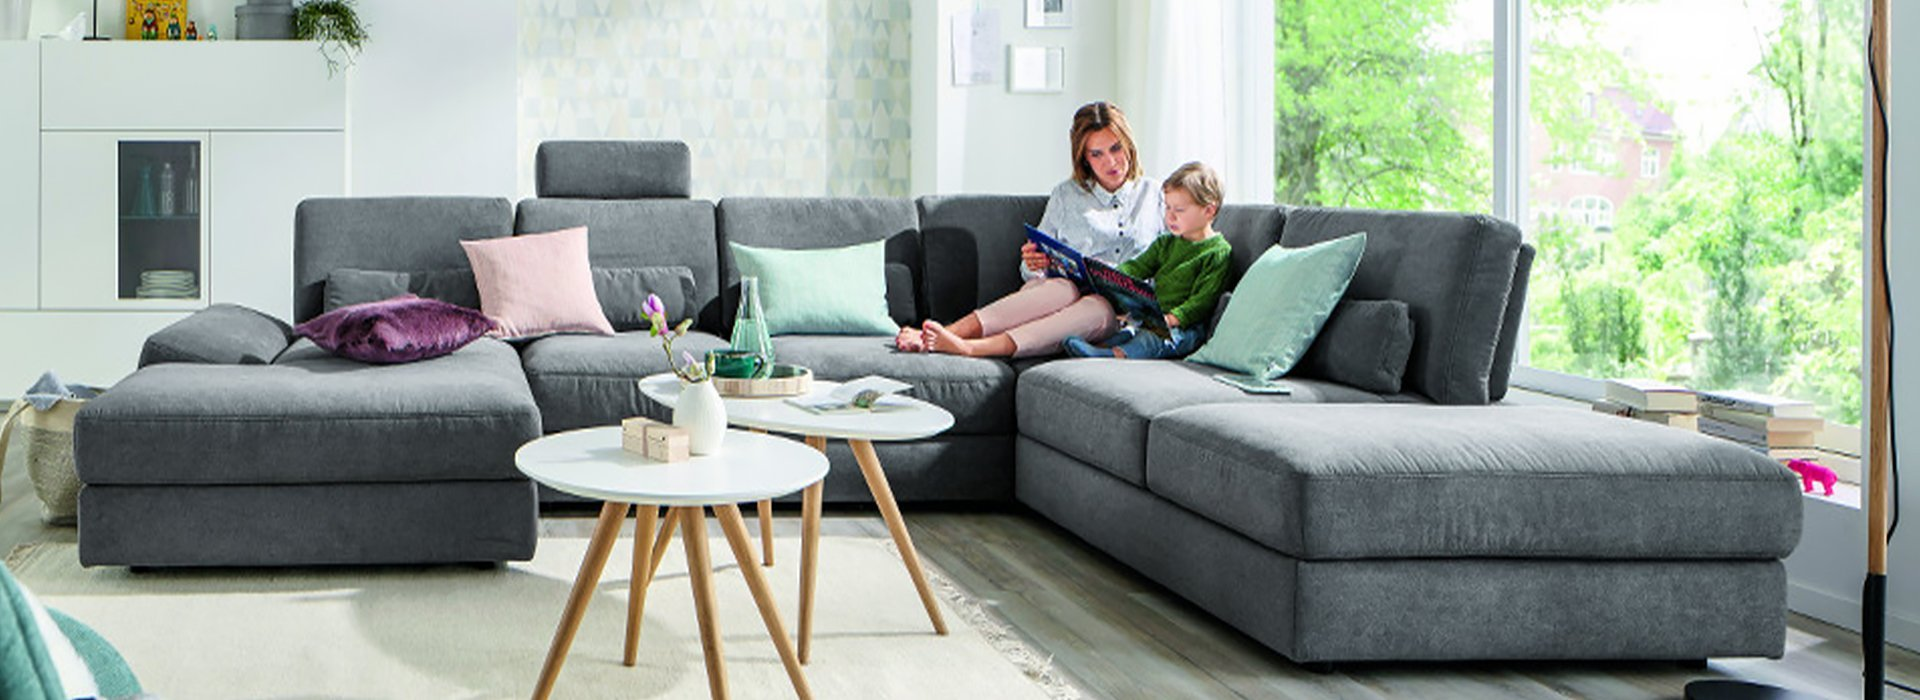 sofa familie